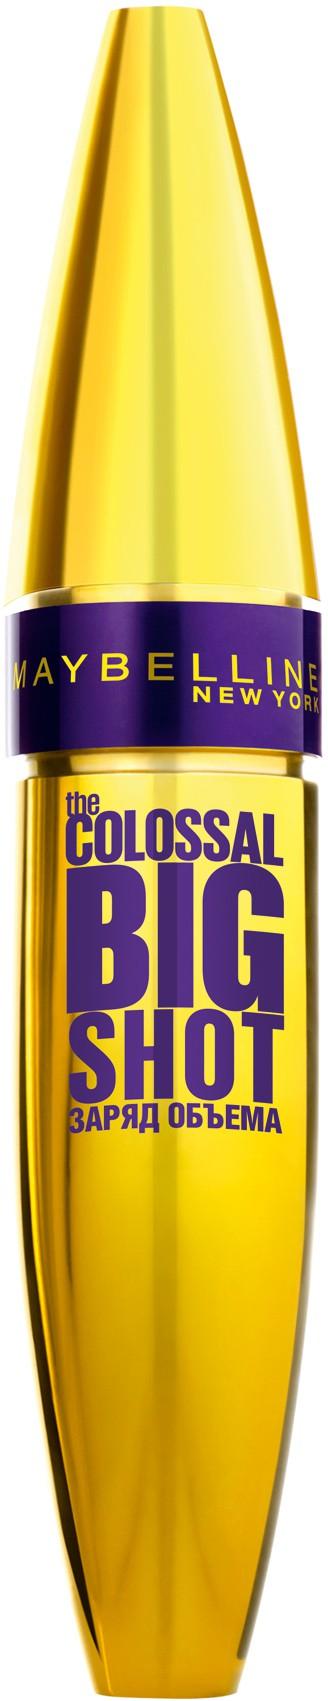 "Maybelline New York Тушь для ресниц ""The Colossal Big Shot"", черная, 9,5 мл"